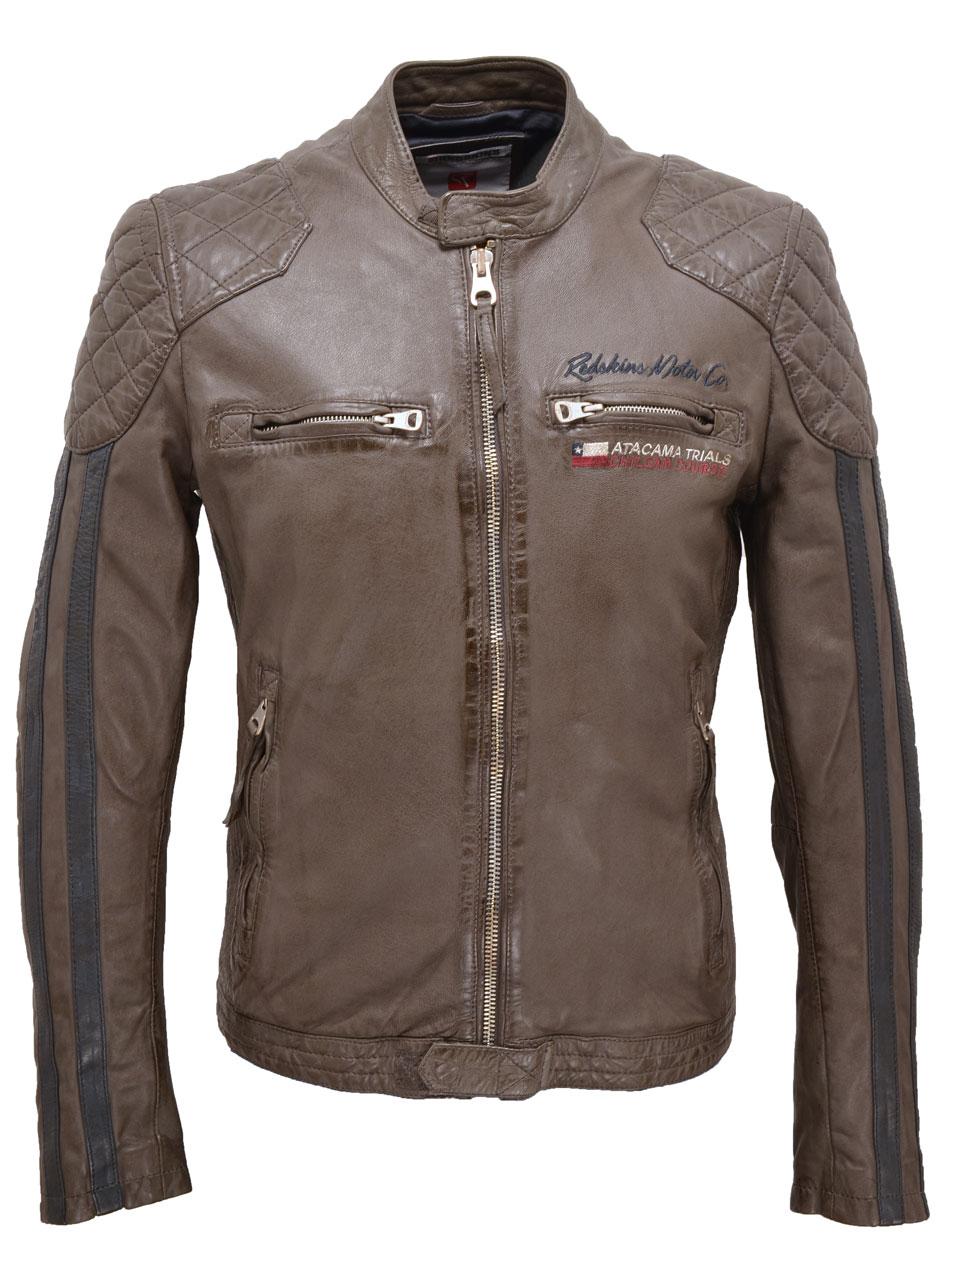 Jackets REDSKINS of leather agneau-ref RIVAS 102 ROCHO red16-à © là ... f88e0f9cf